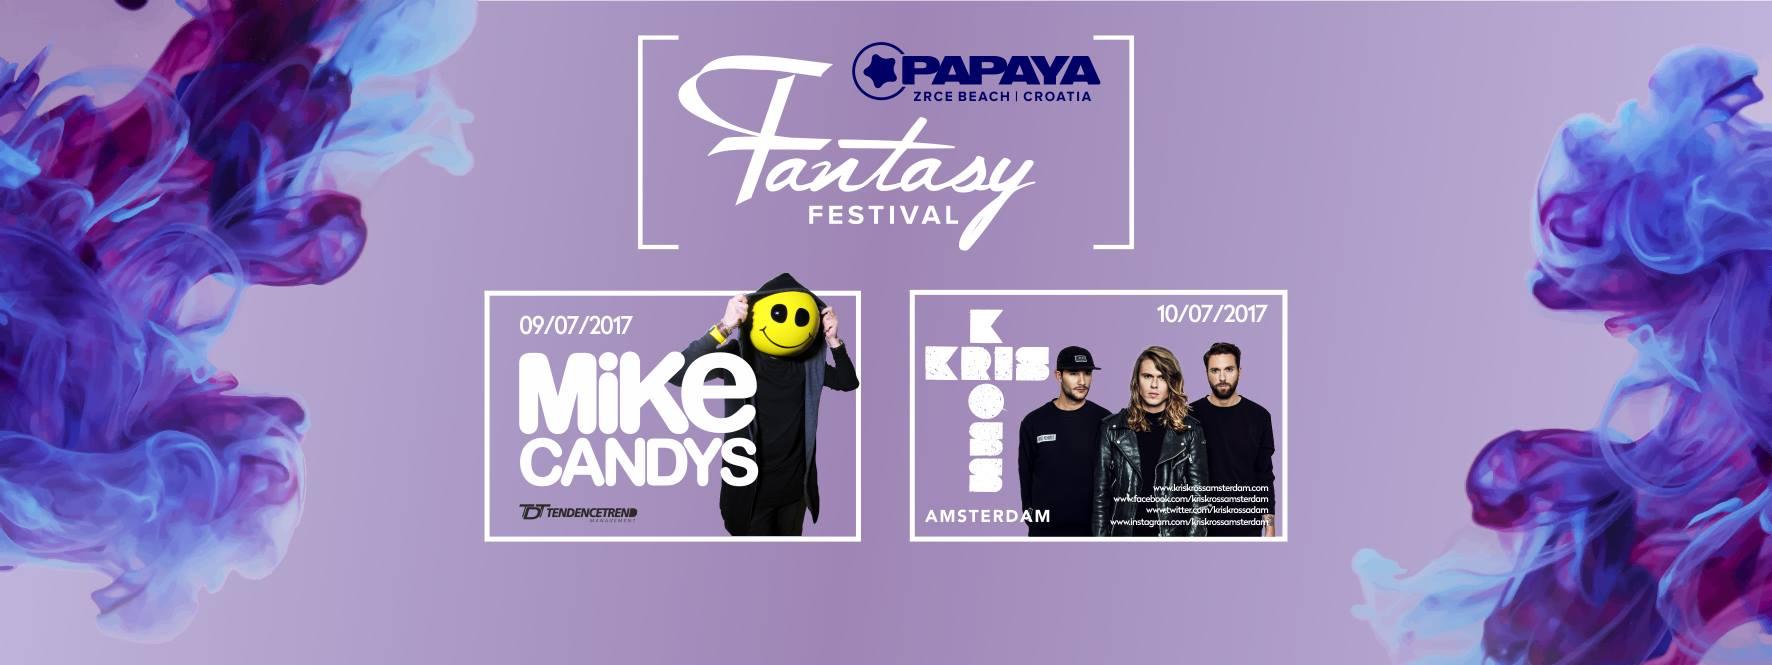 Fantasy Festival 2017